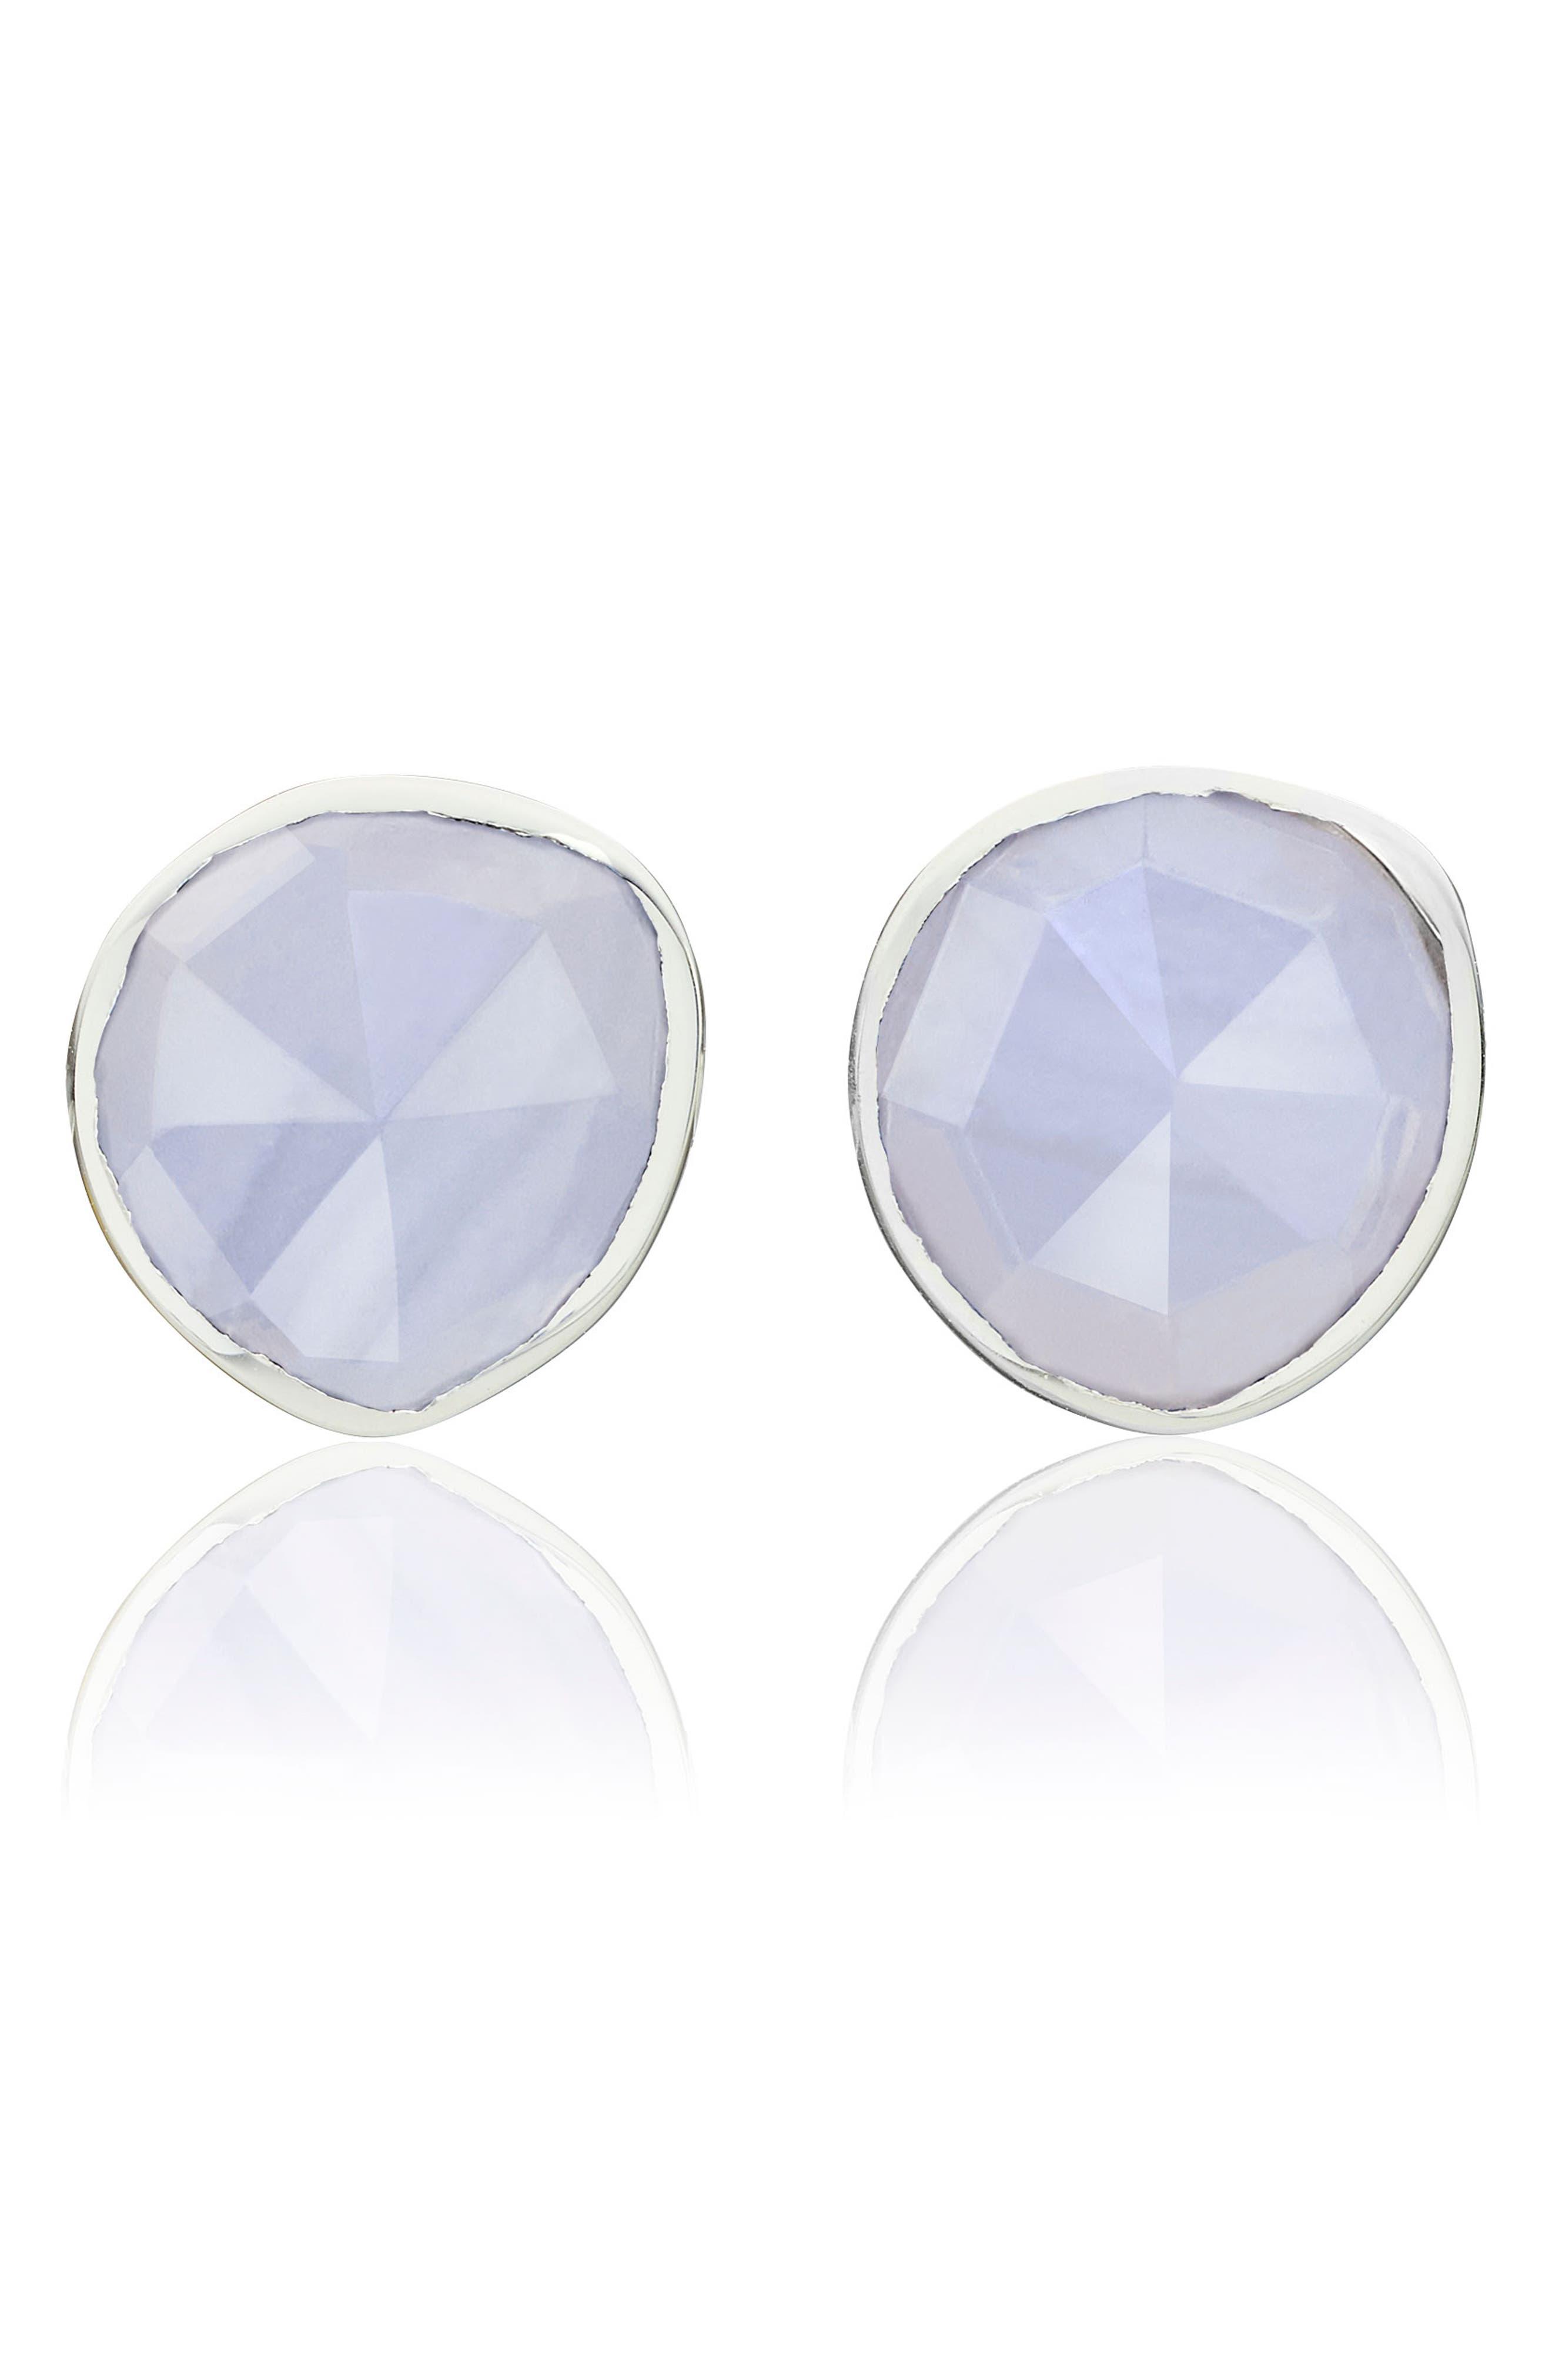 Siren Stud Earrings,                         Main,                         color, Silver/ Blue Lace Agate